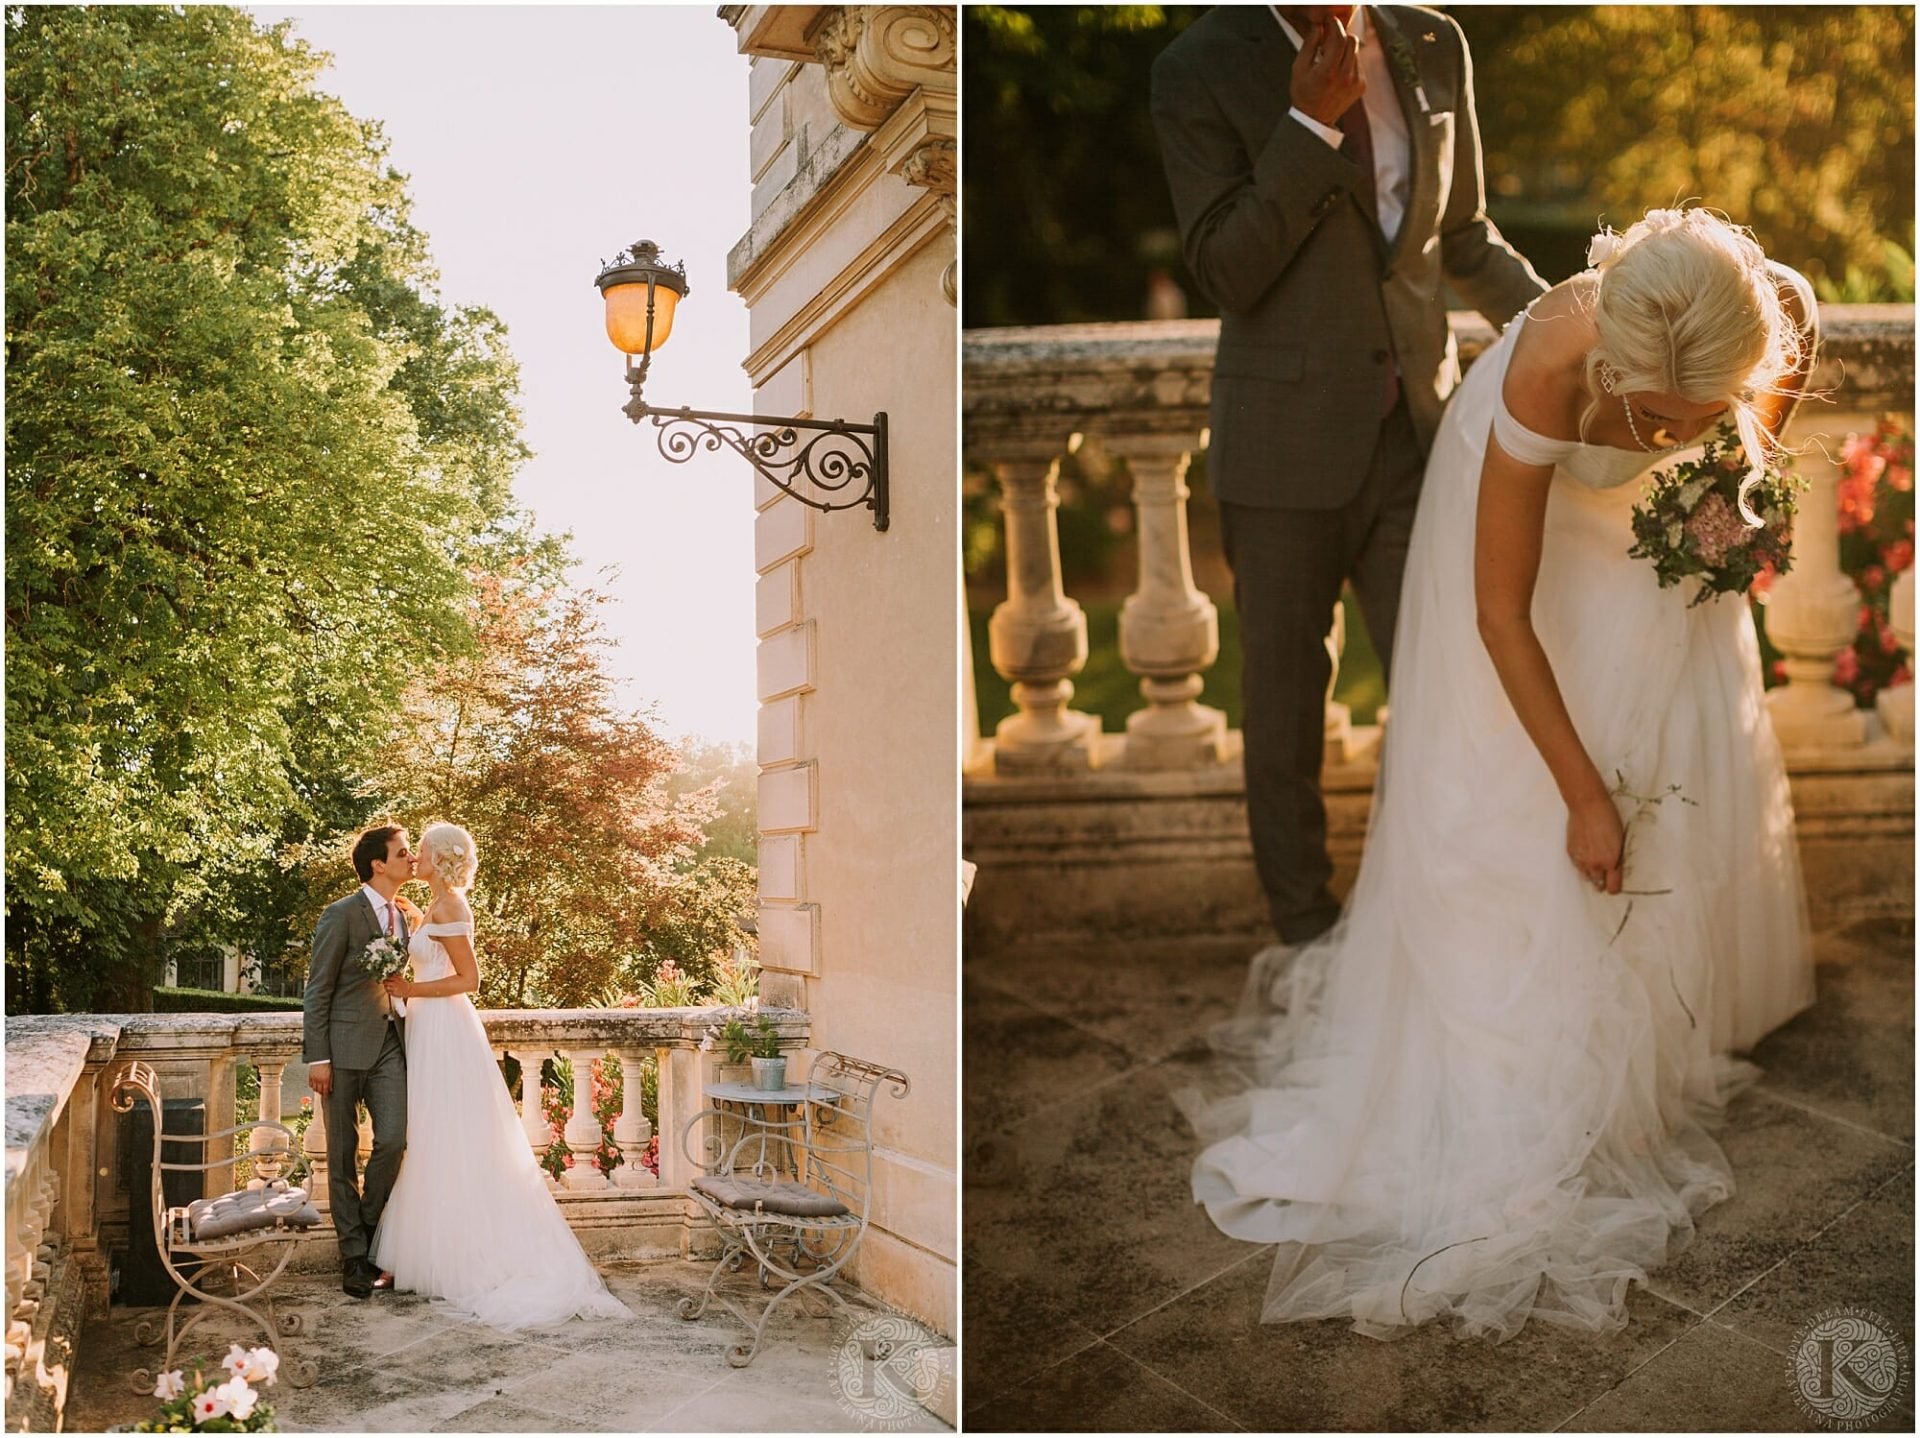 Kateryna-photos-photographe-mariage-chateau-des-3-fontaines-provence-avignon-vaucluse-sud_0097.jpg